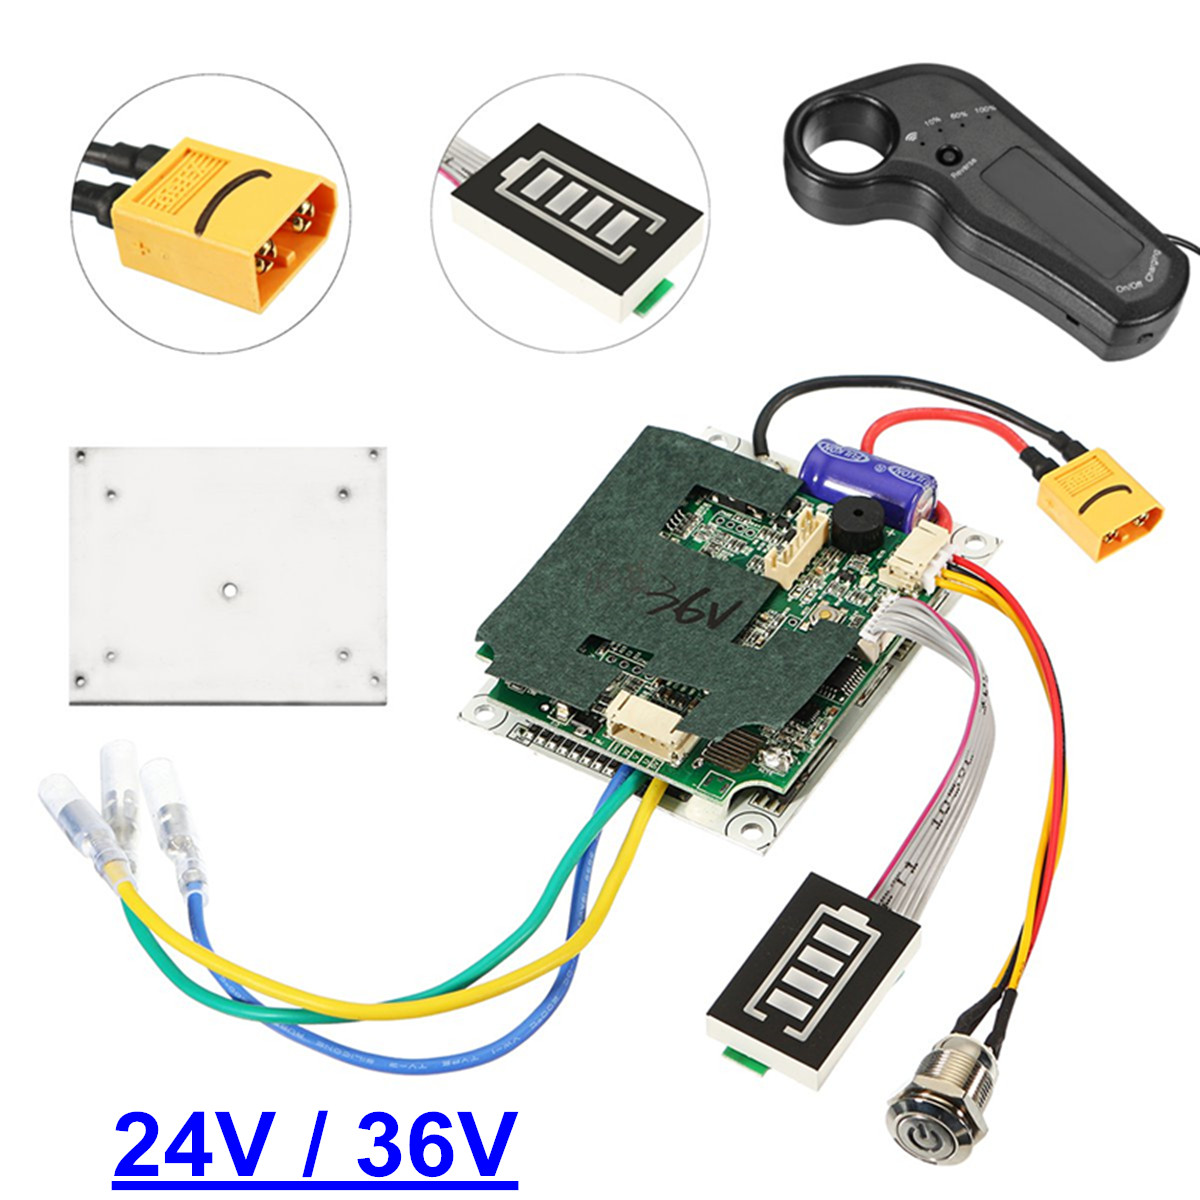 24/36V Single Belt Motor Electric Skateboard Controller Longboard ESC Substitute Parts Scooter Mainboard Instrument Tools